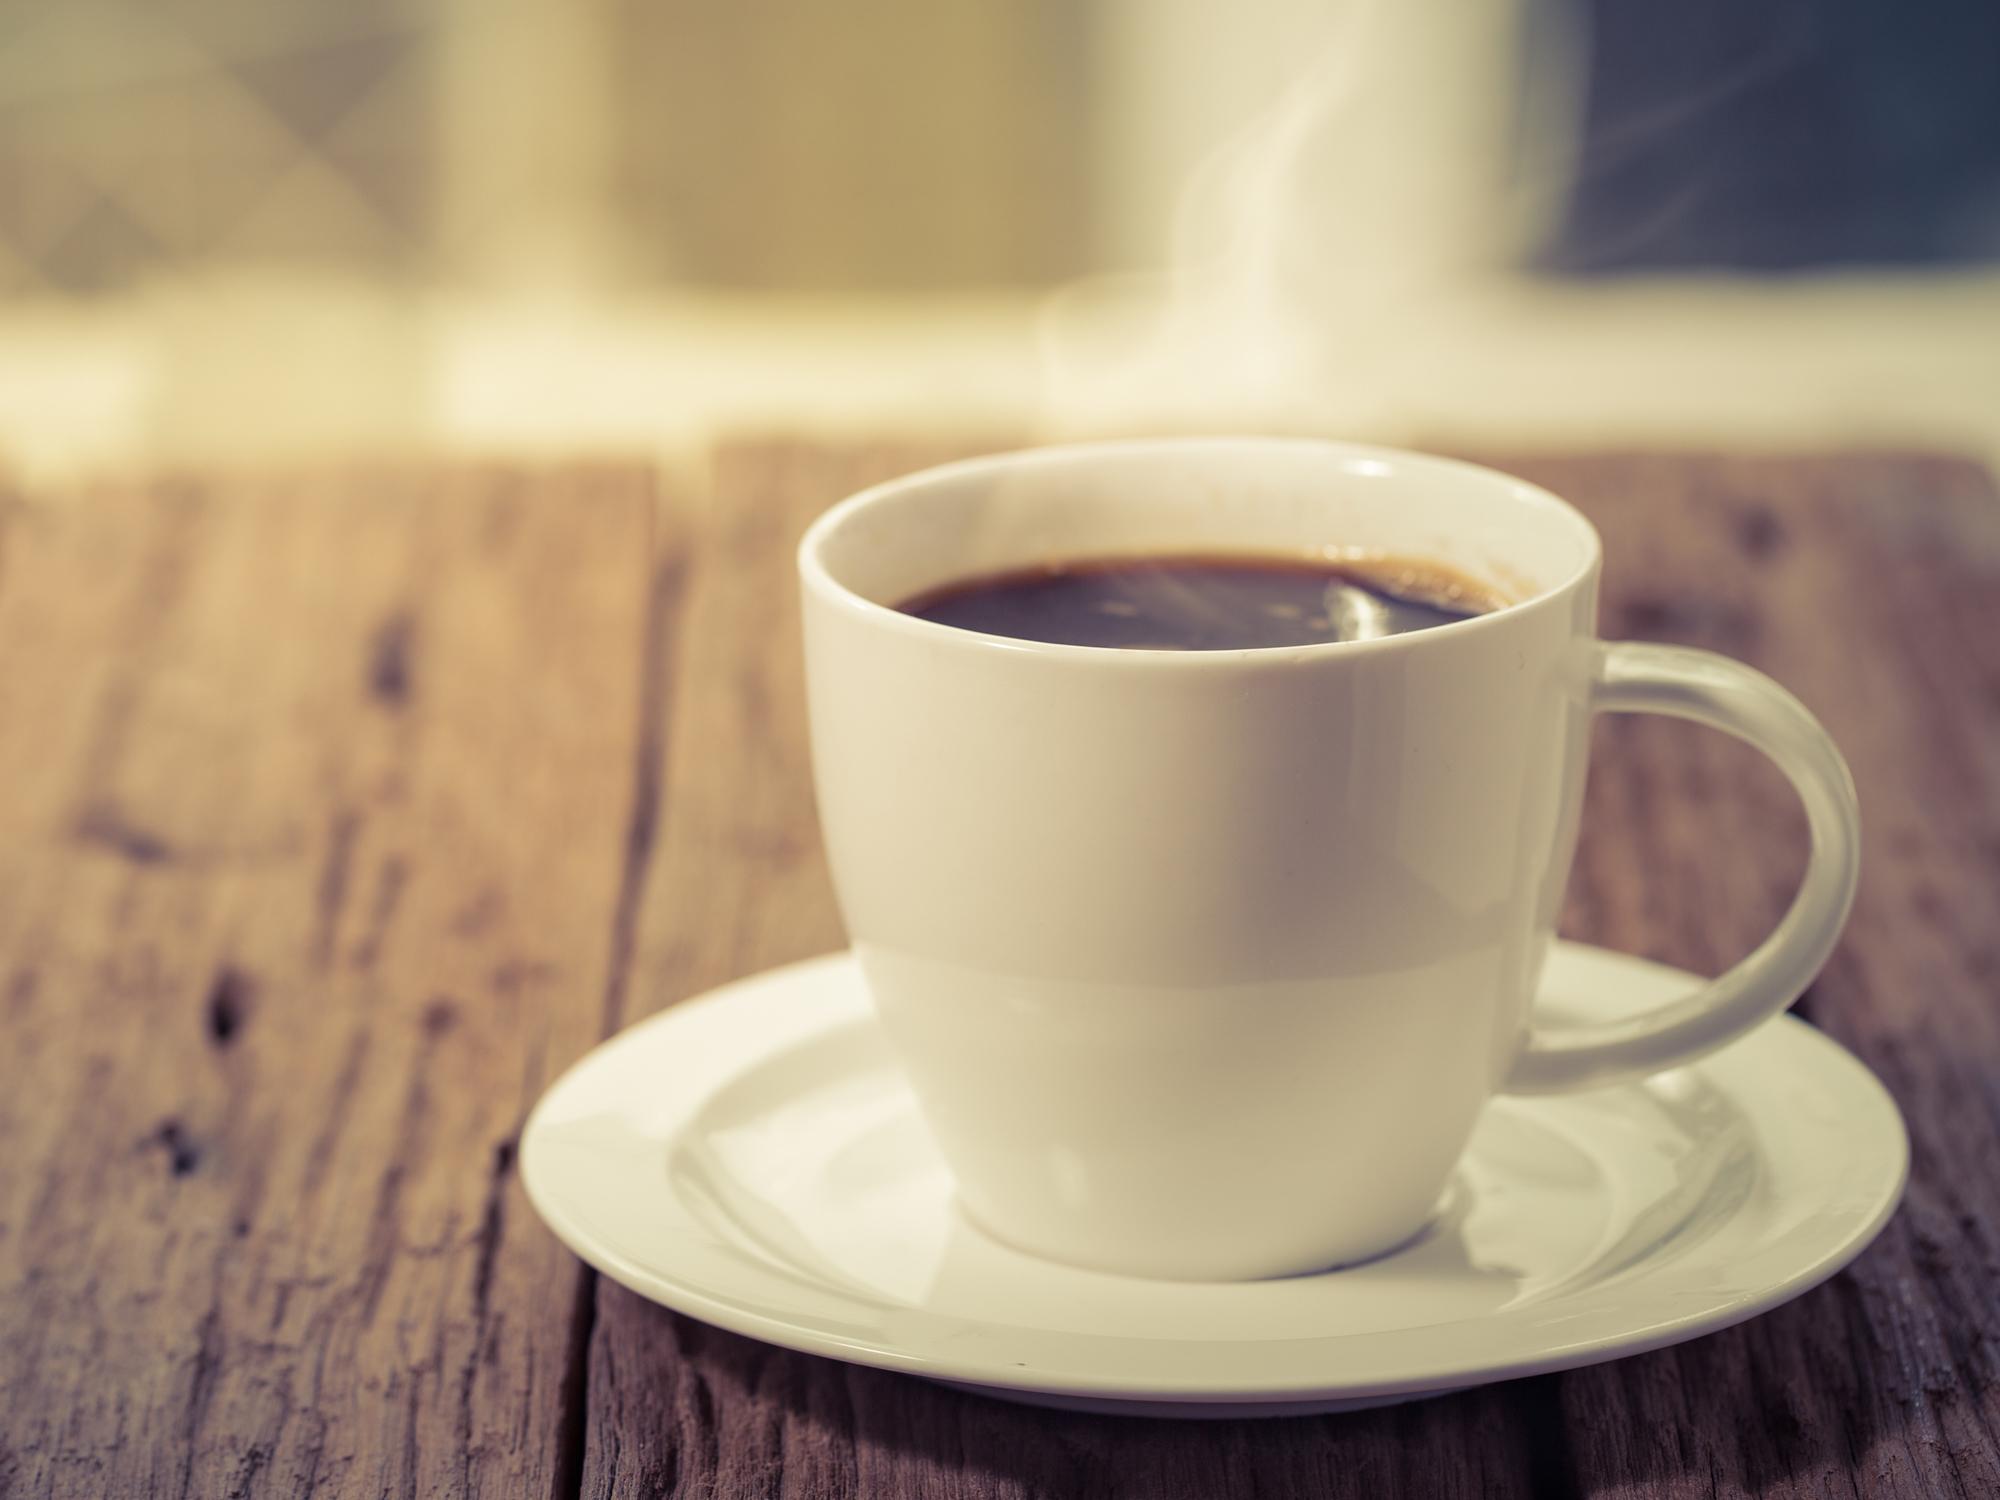 Absurd harm to coffee